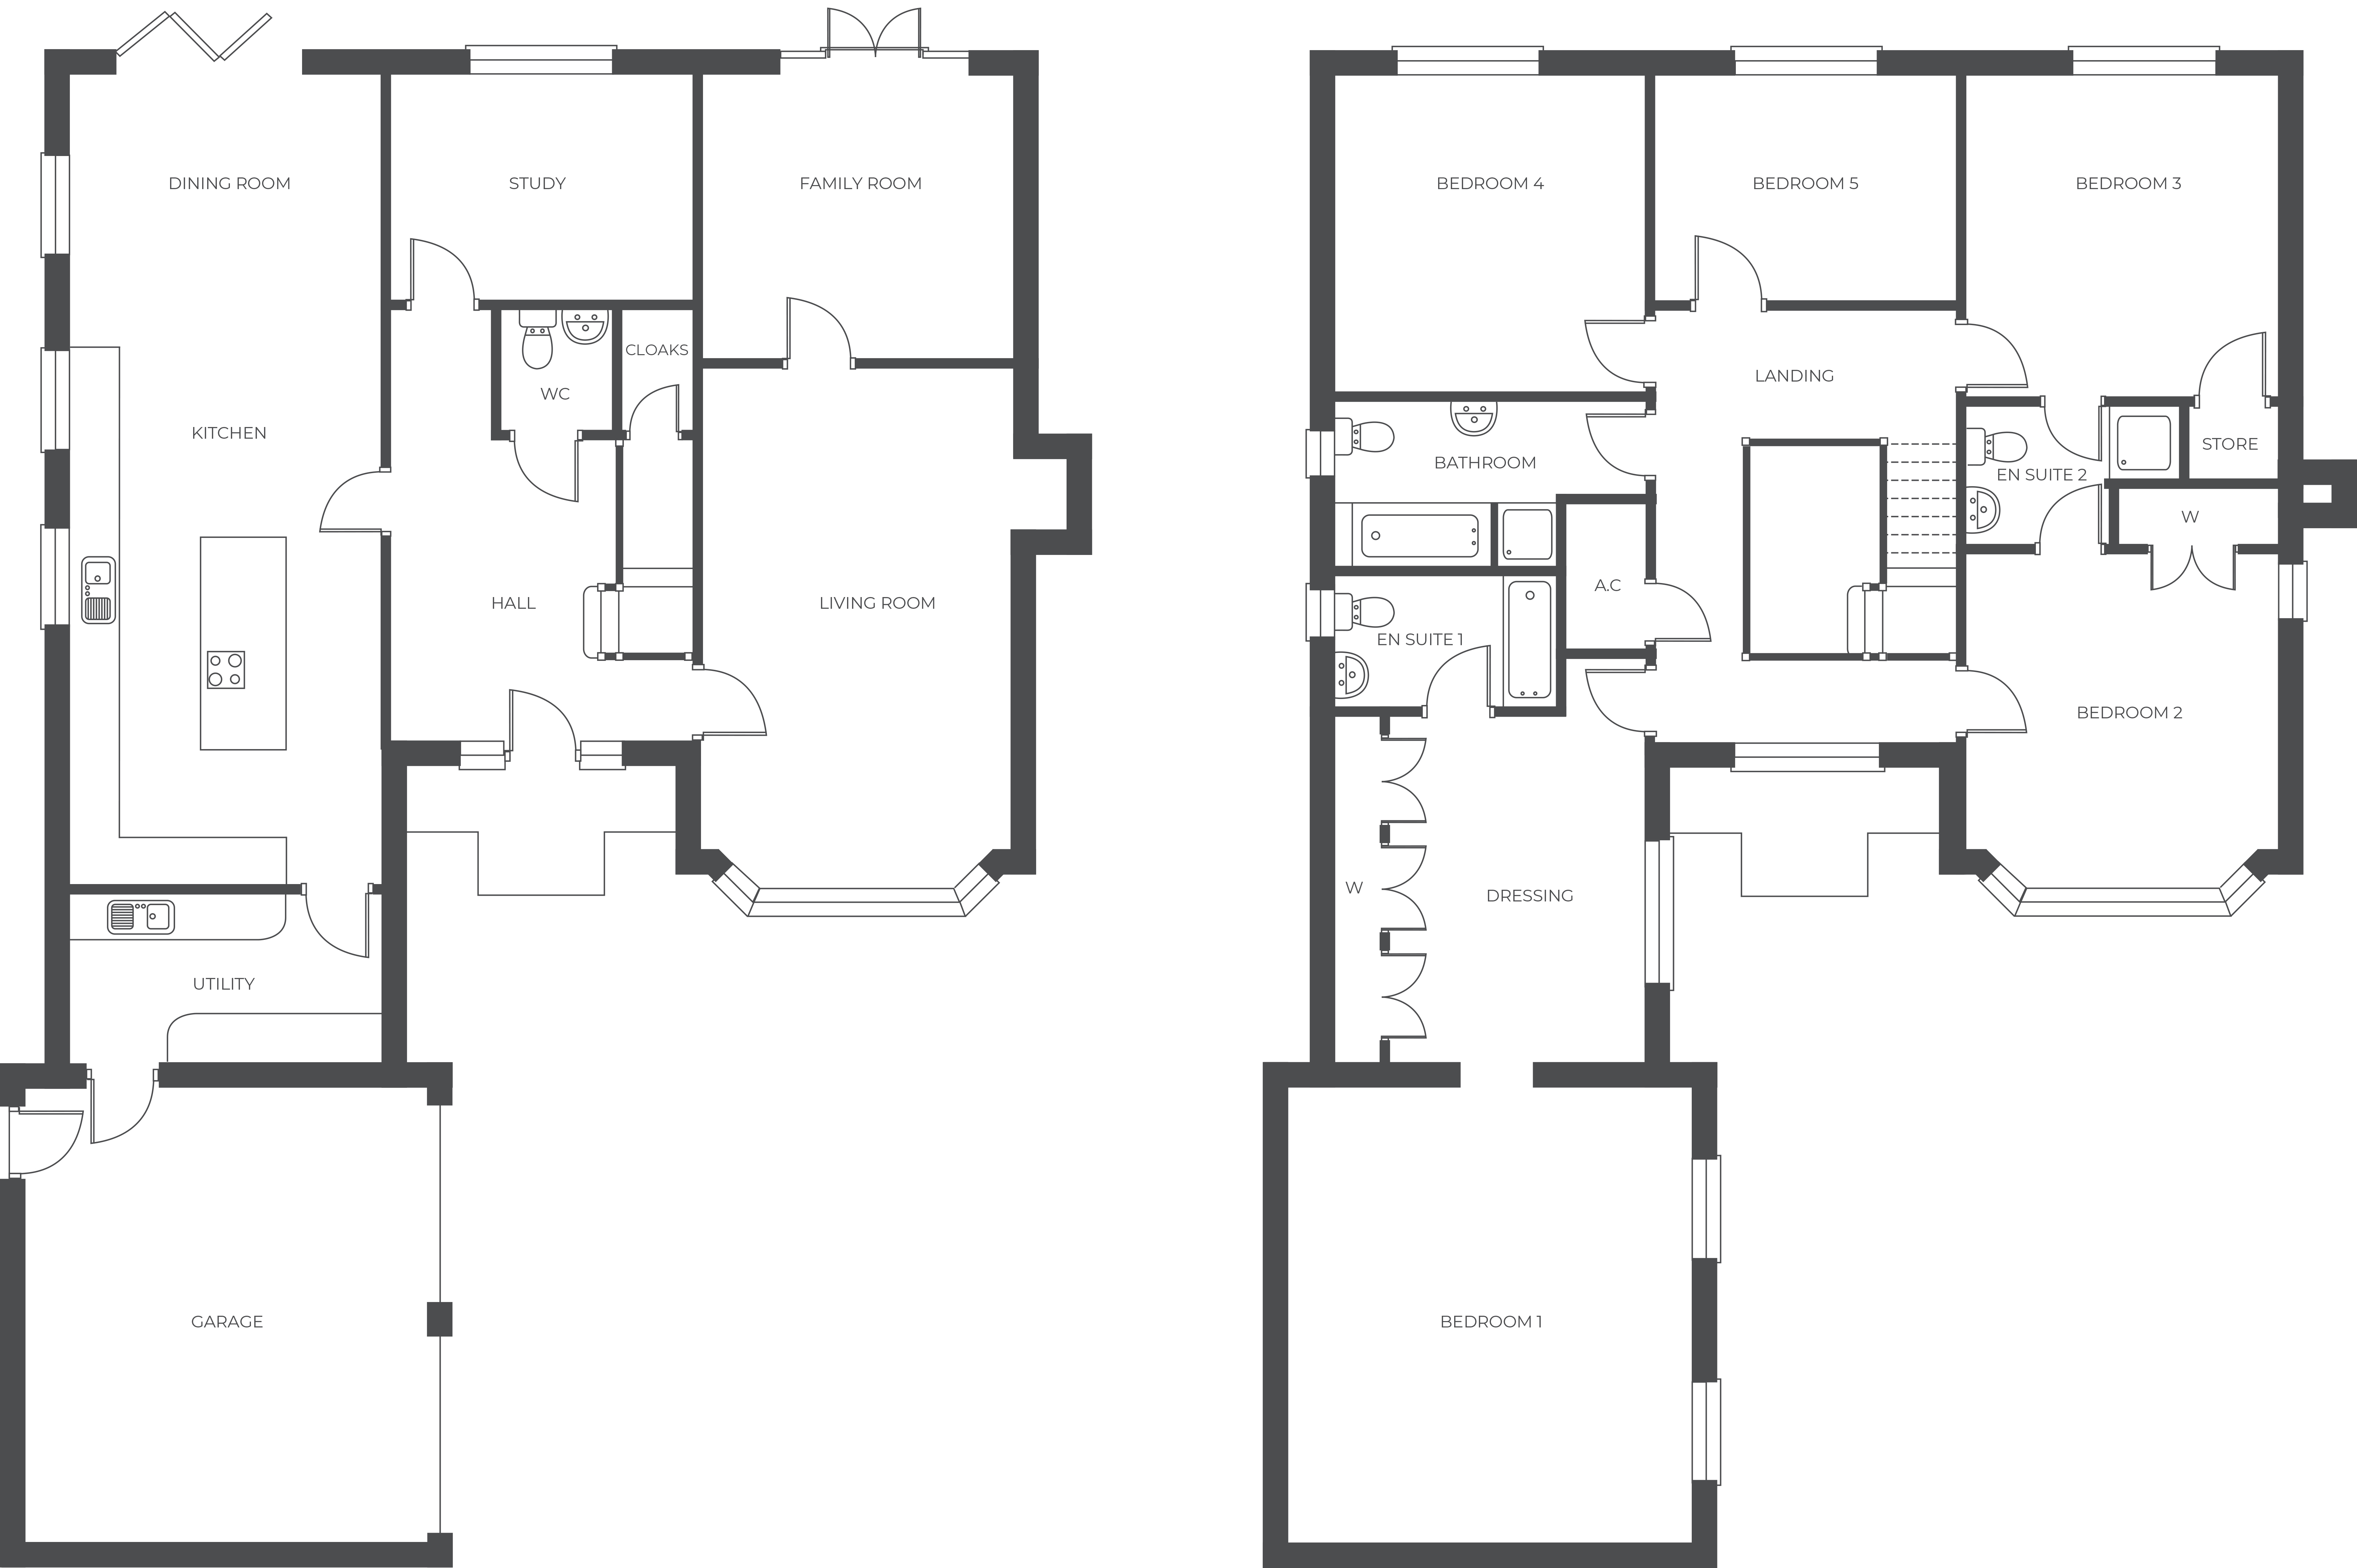 The Meadows, Plot 3 floor plan